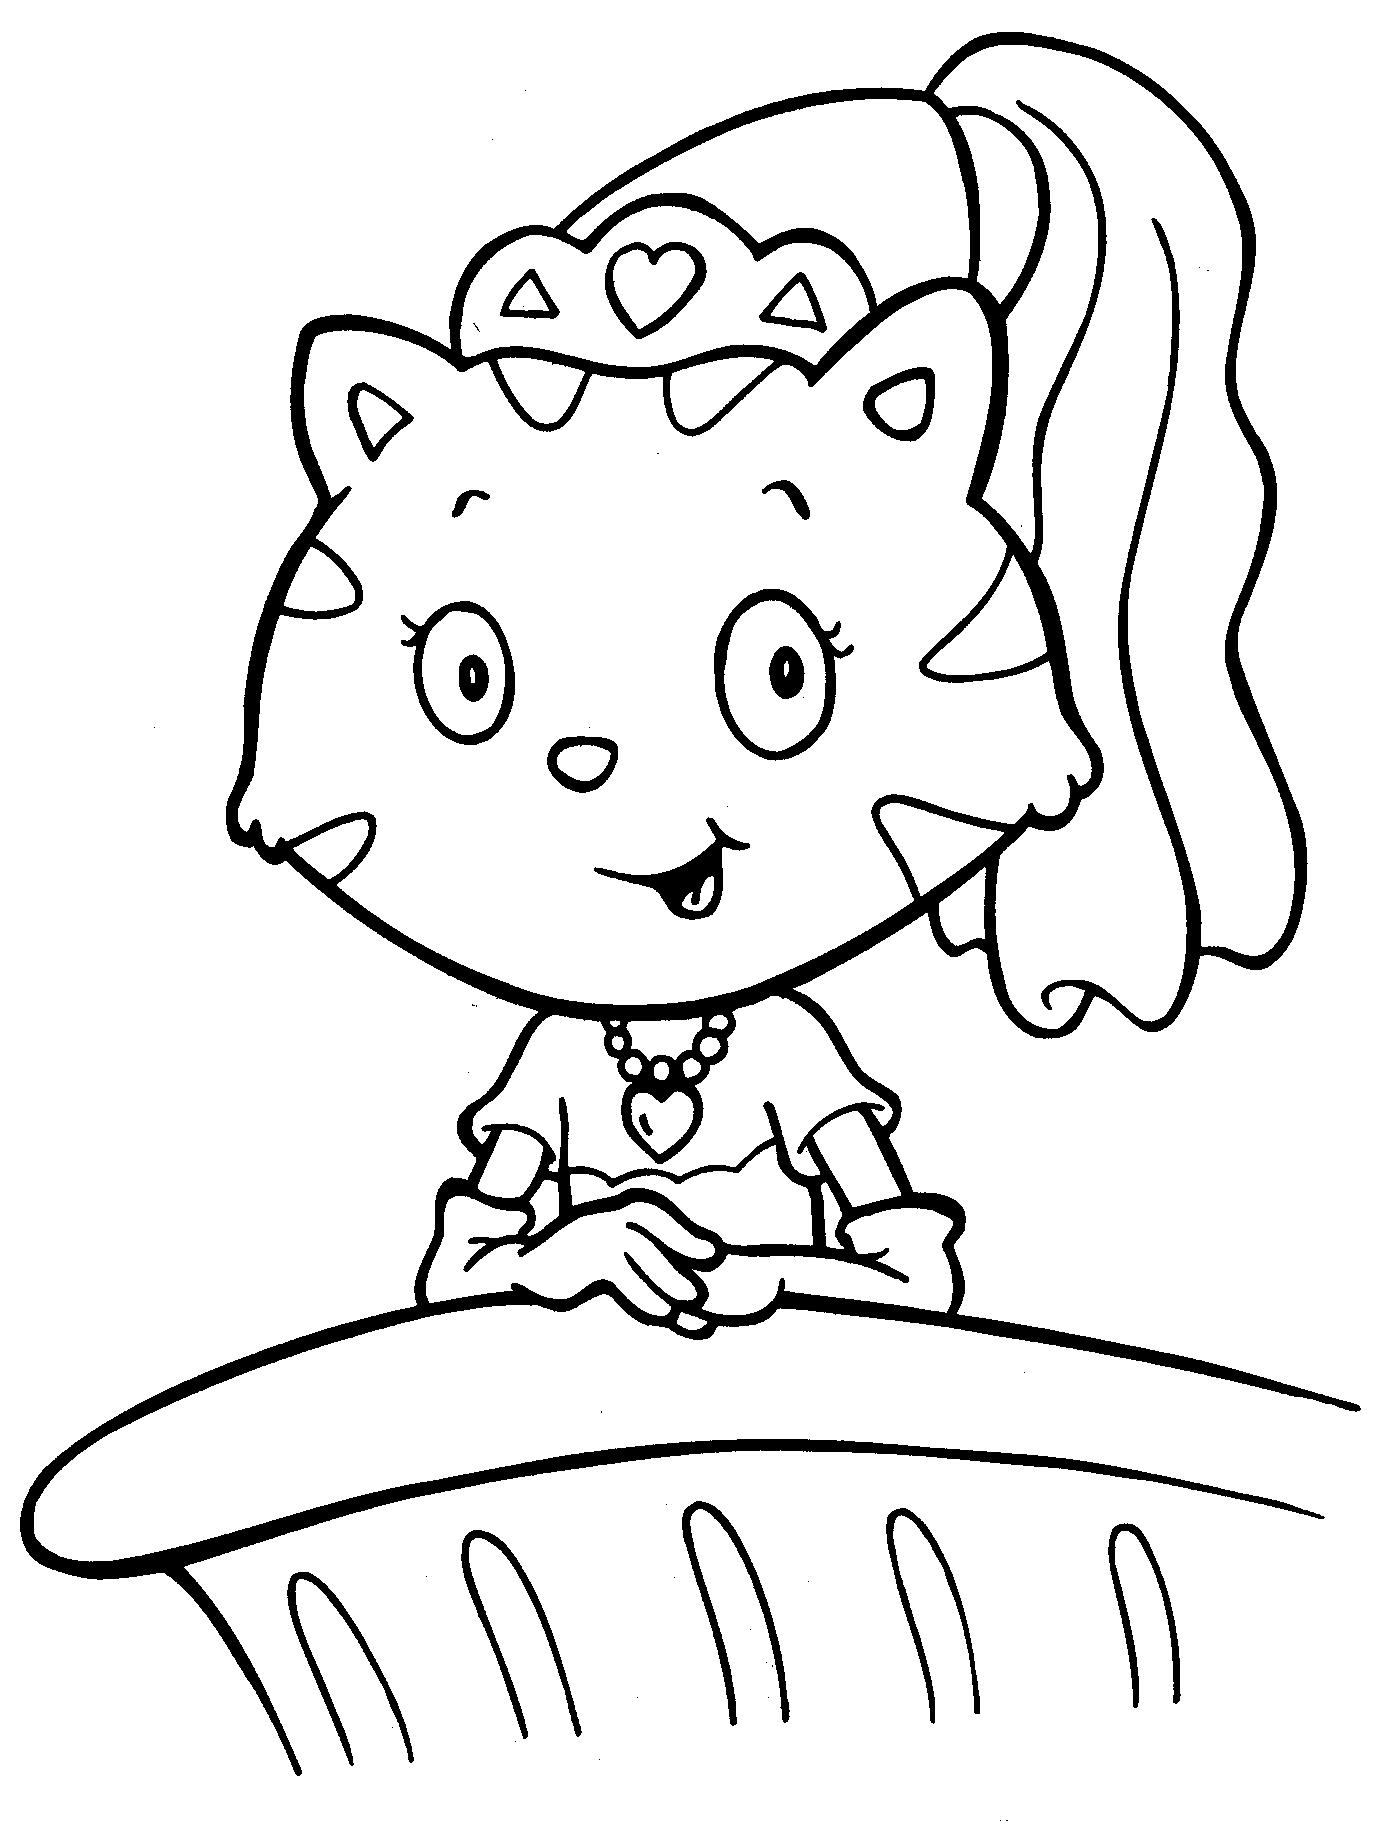 Princess Kitten Coloring Pages Az Coloring Pages Princess Hello Coloring Pages